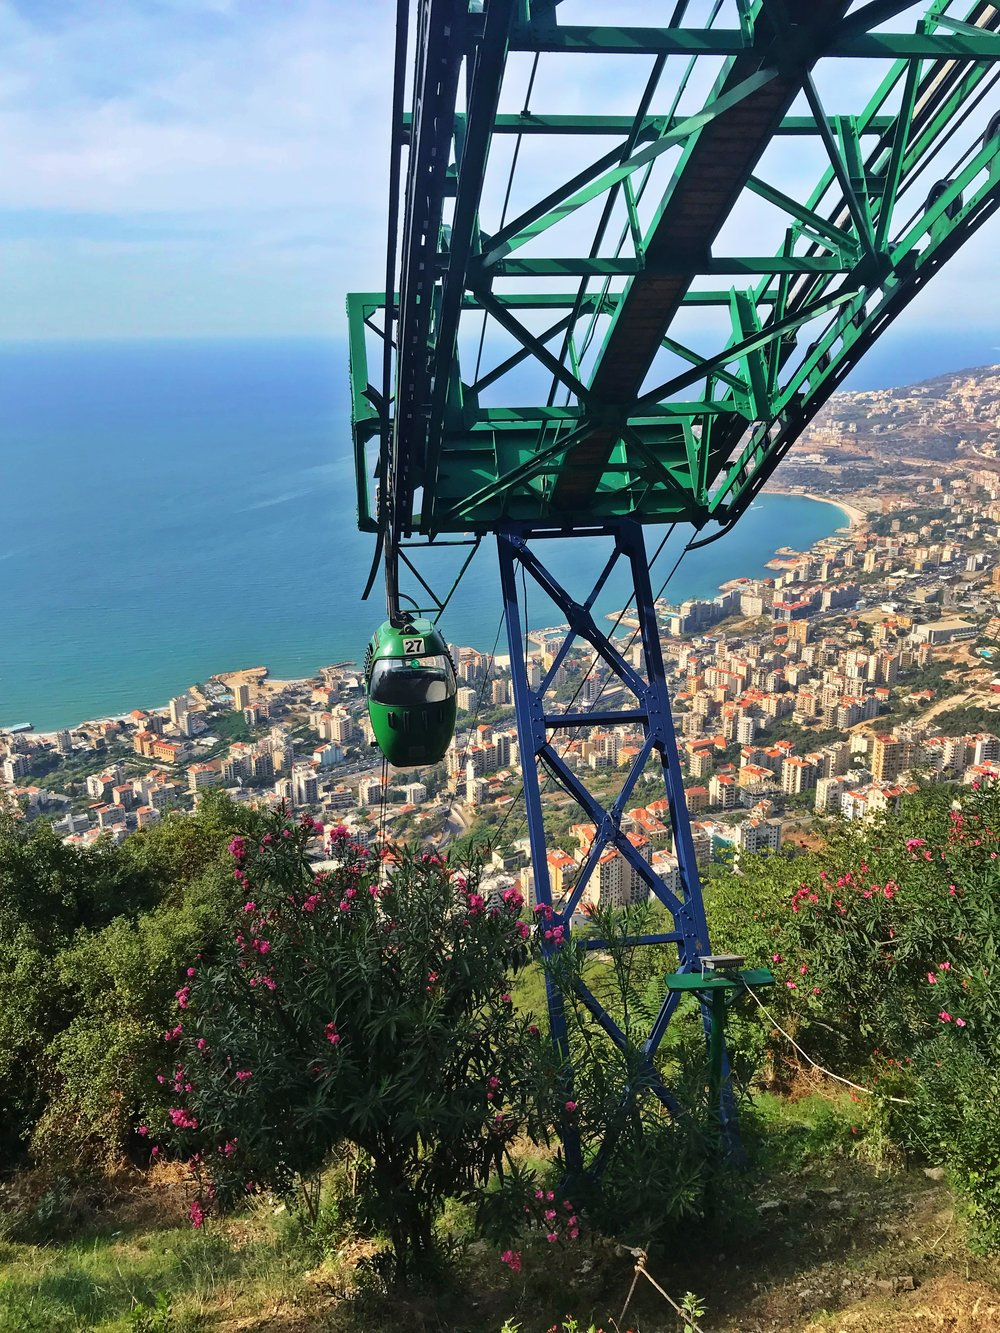 Harissa - Lady of Lebanon